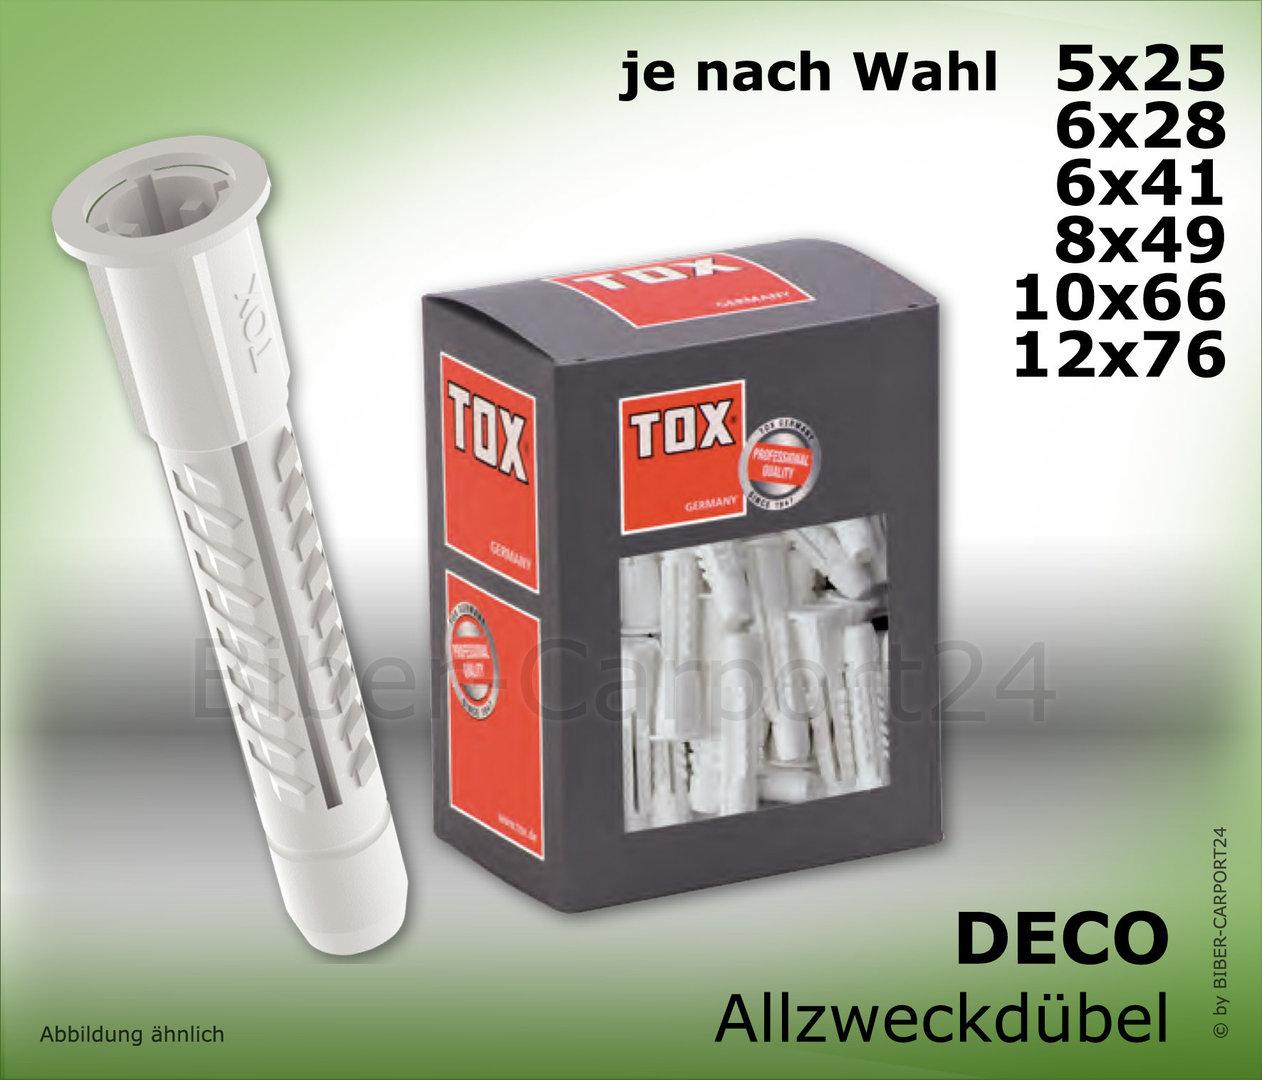 tox deco allzweckd bel 4as k made in germany. Black Bedroom Furniture Sets. Home Design Ideas